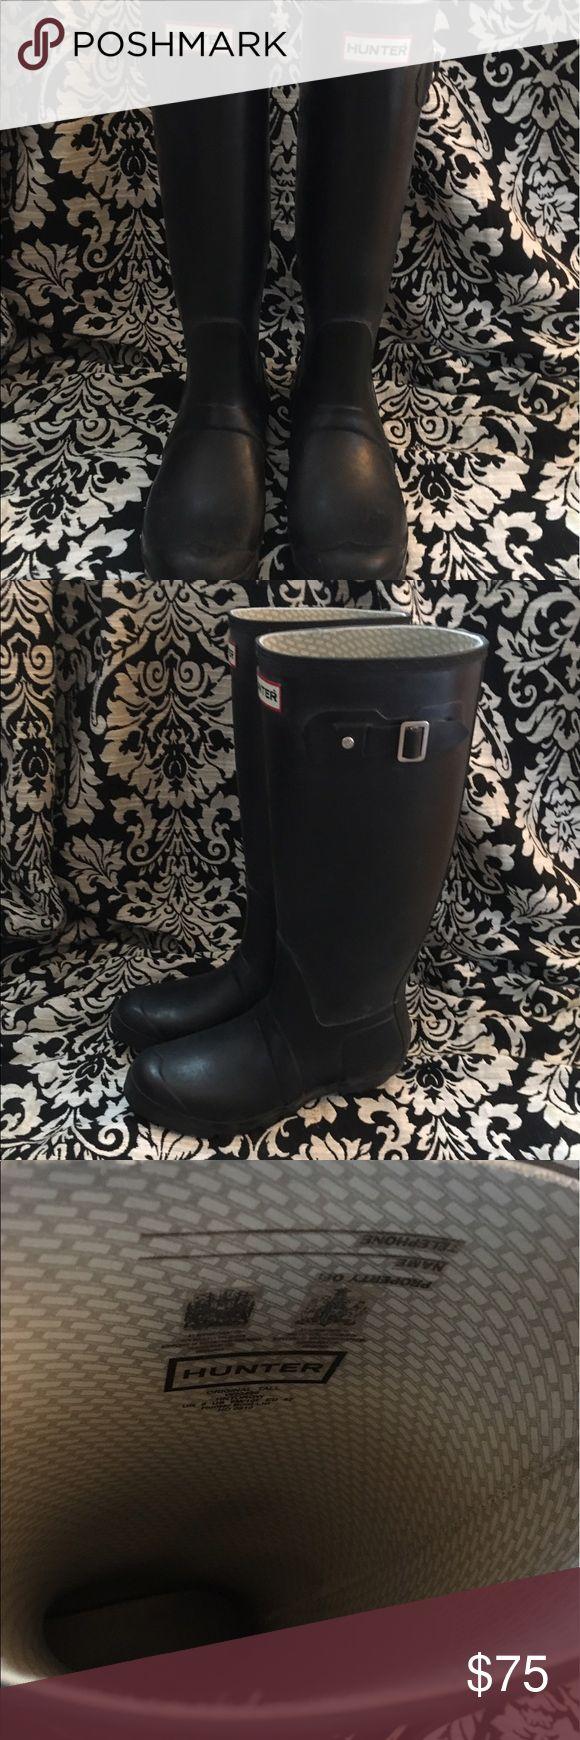 Original Tall Hunter Rain Boots Black original tall Hunter rain boots - slightly worn, but still in great condition! Hunter Boots Shoes Winter & Rain Boots